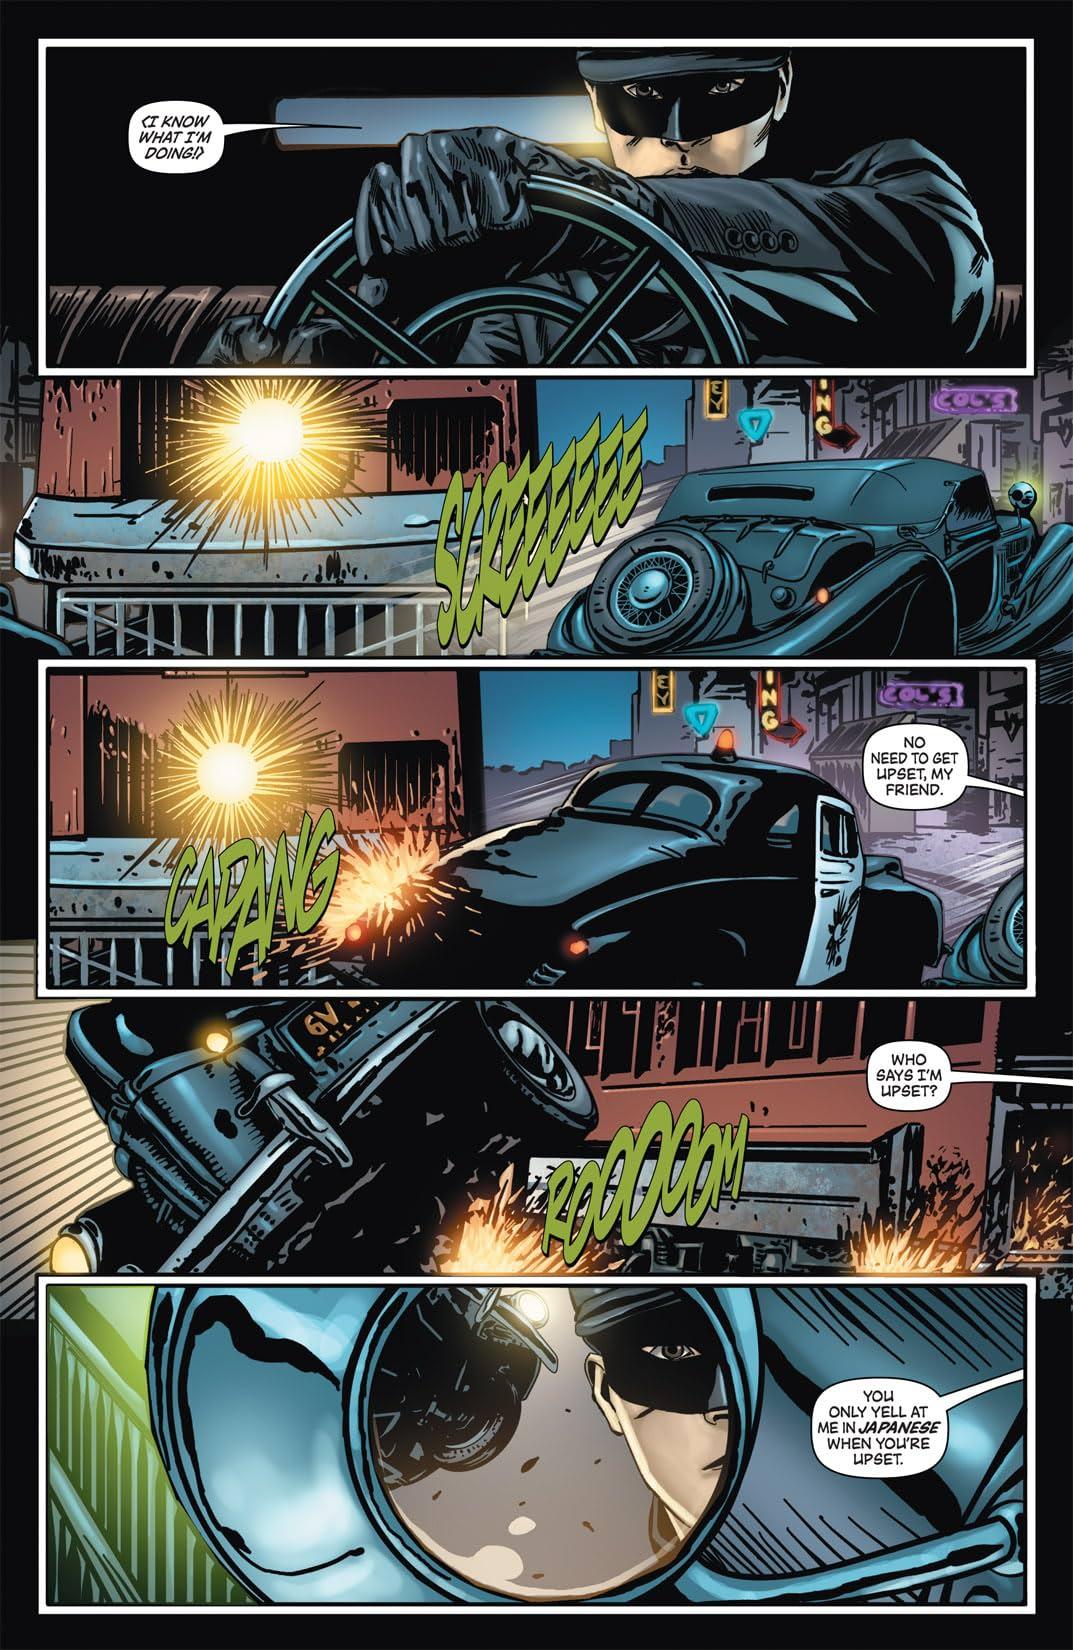 Kato Origins: Way of the Ninja #1